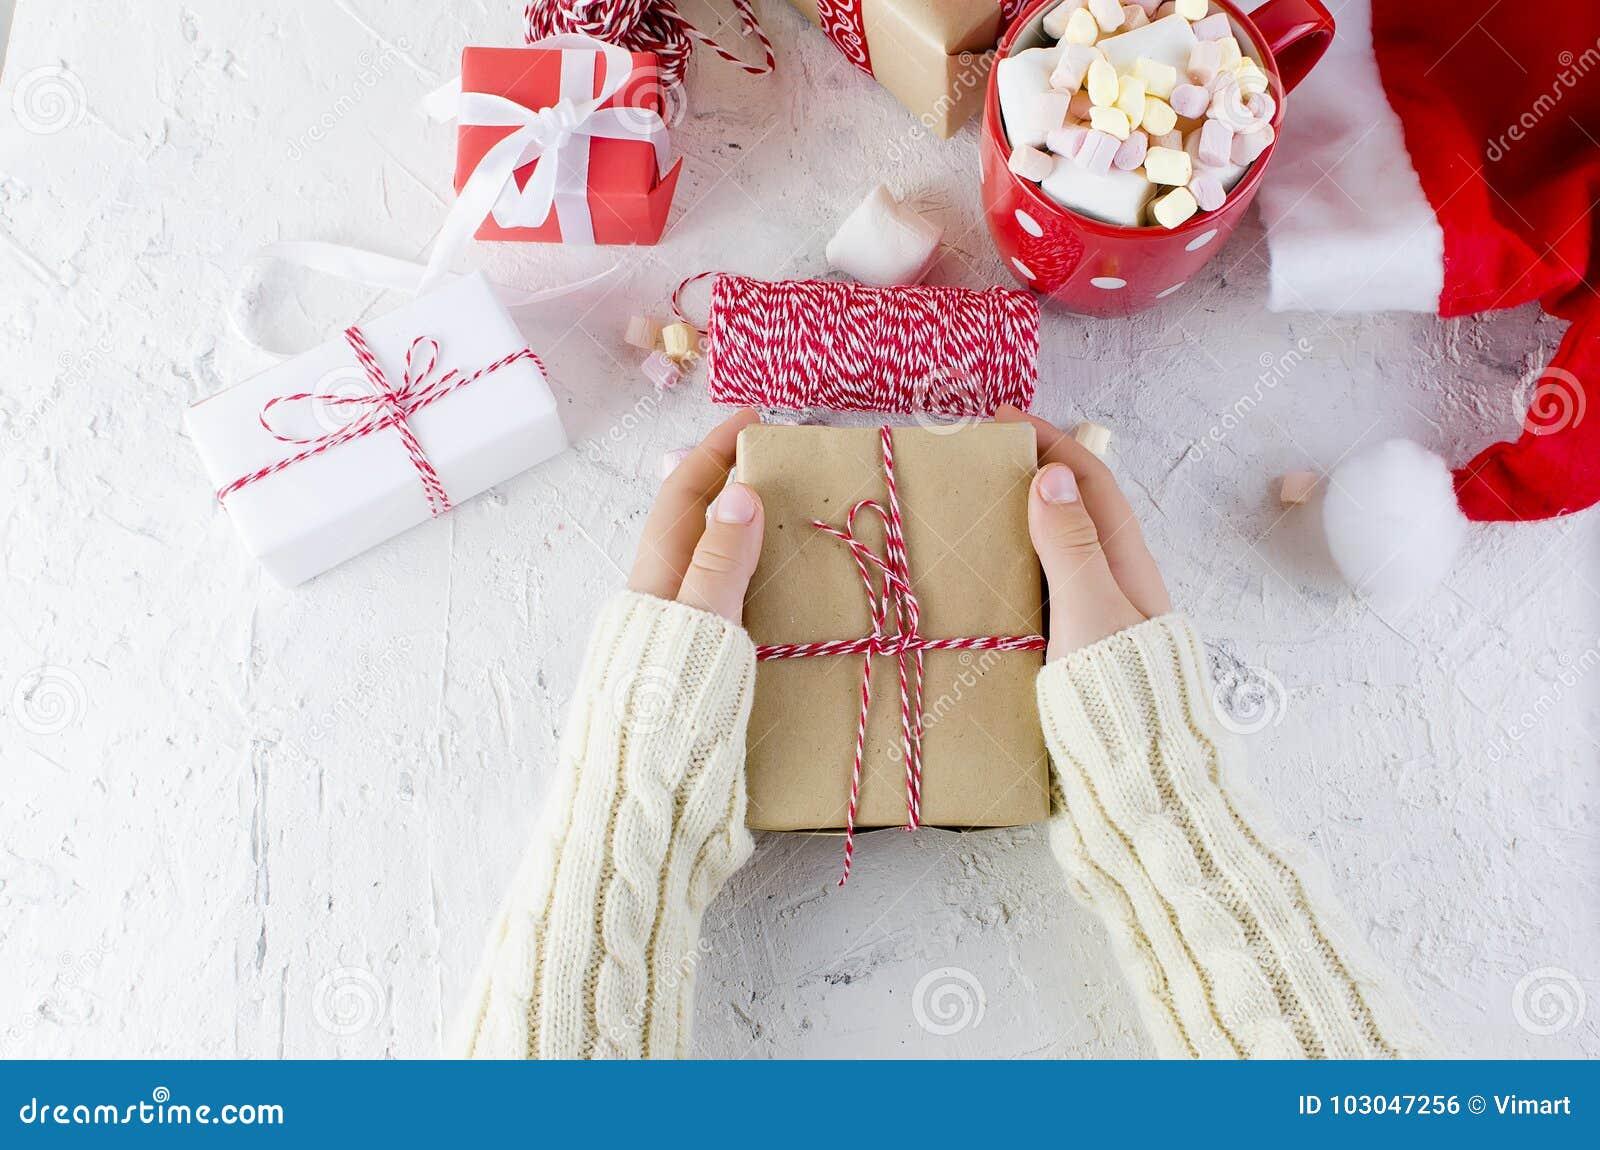 Baby Packs A Handmade Gift. Christmas Gifts, Stock Photo ...